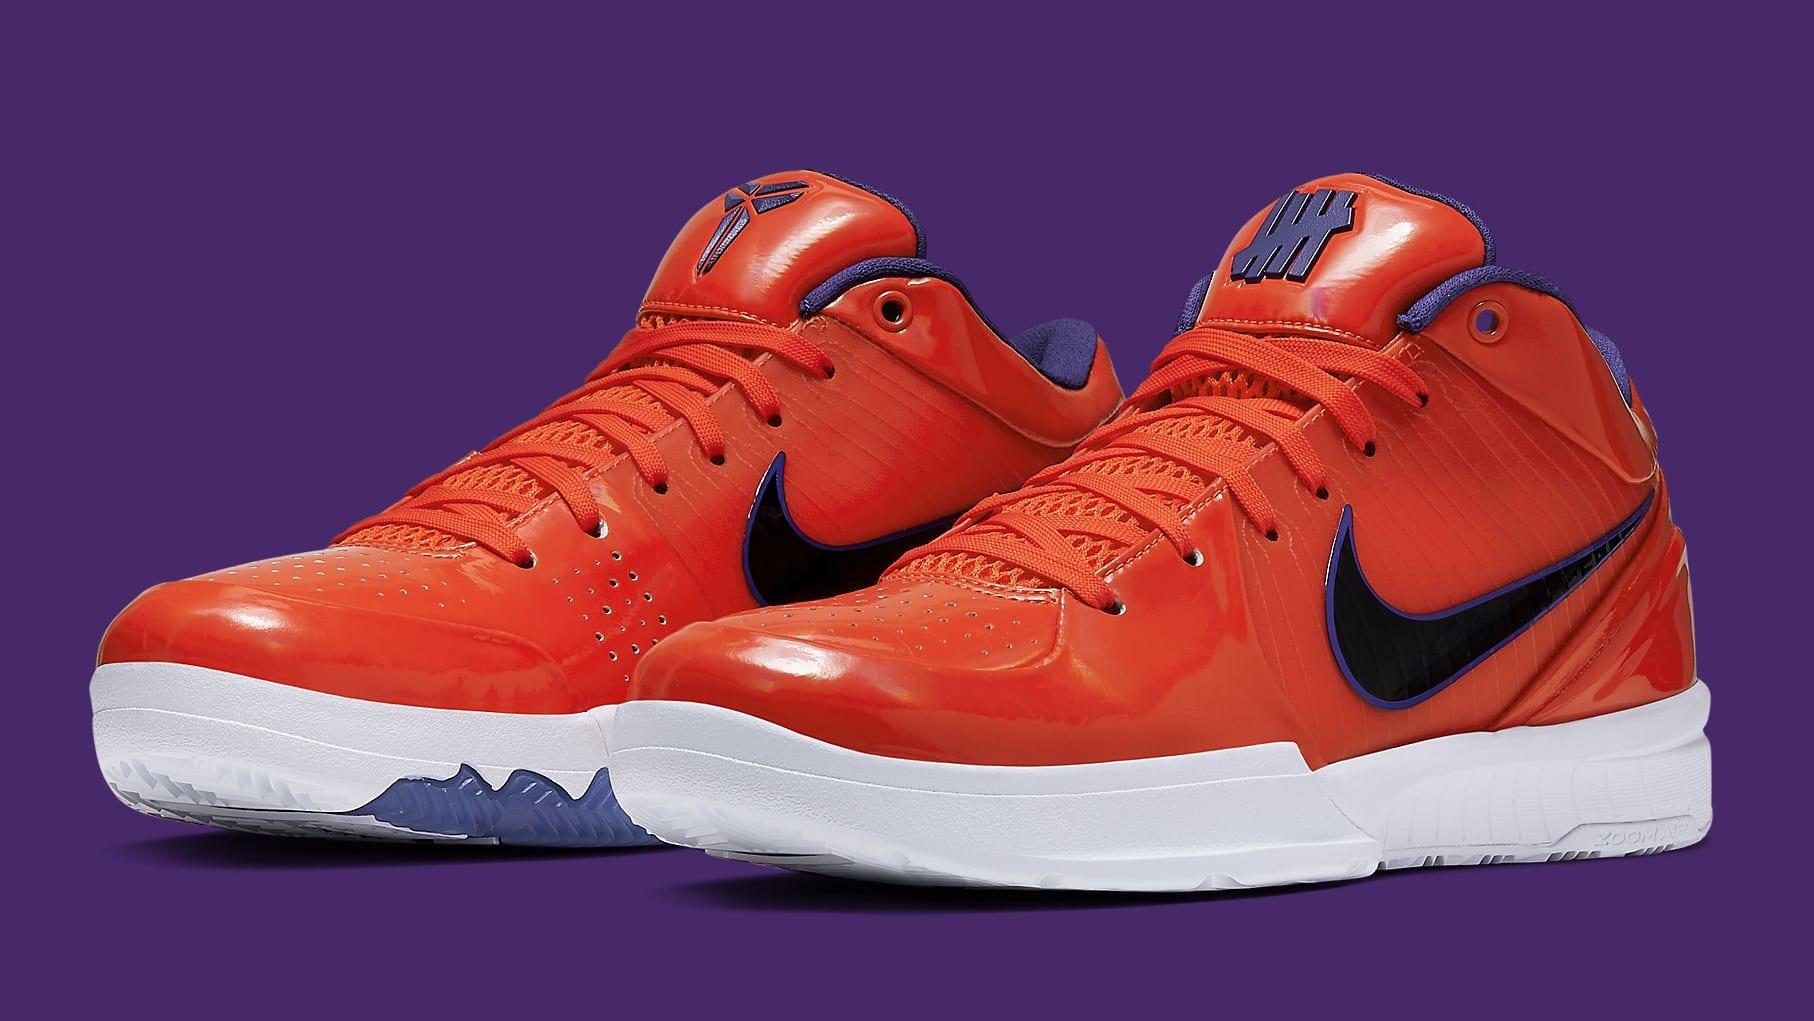 UNDFTD x Nike Kobe 4 Protro Orange Release Date CQ33869-800 Pair